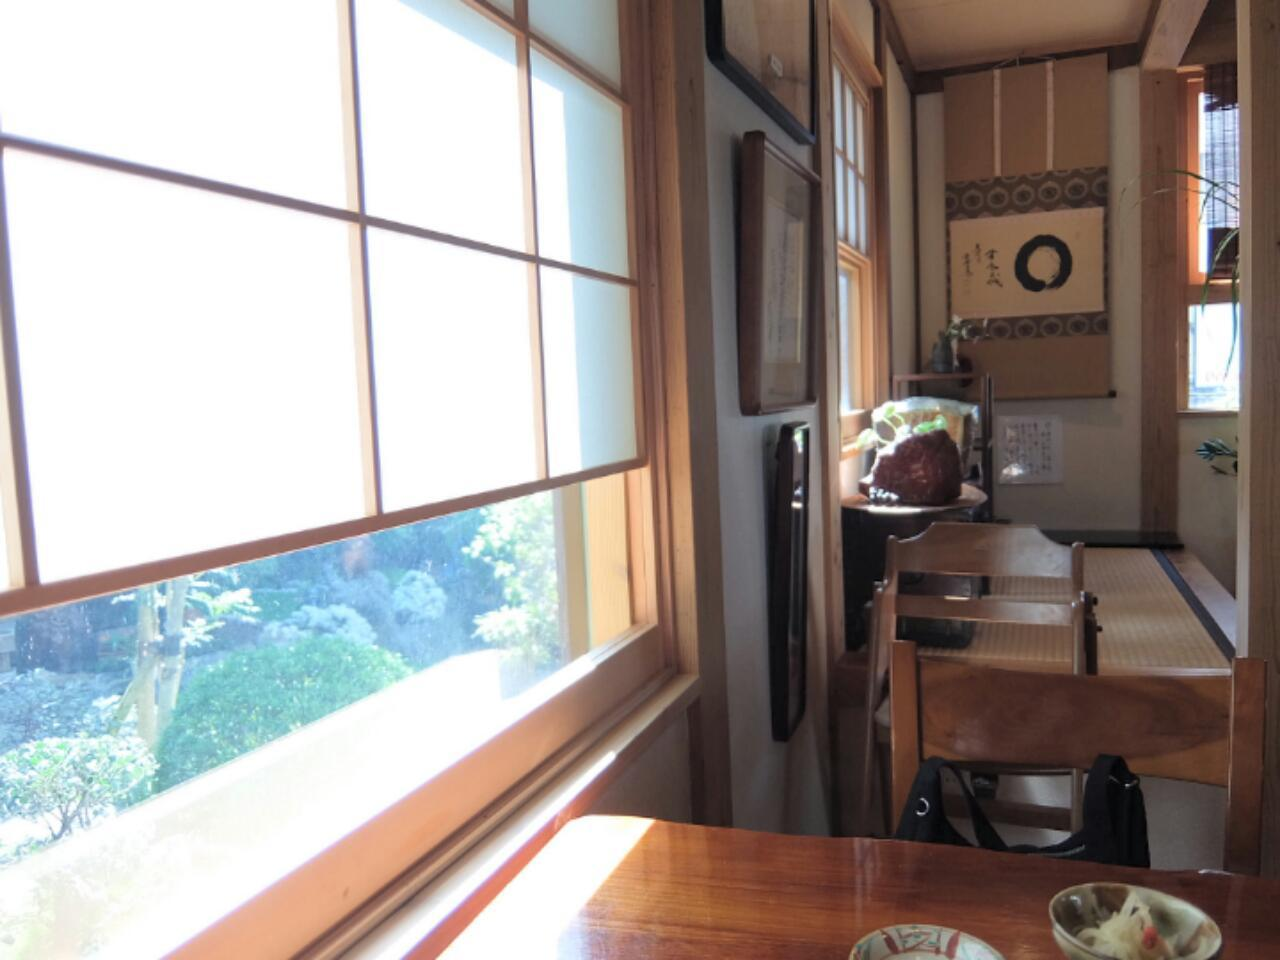 《SW沖縄の旅》沖縄第一ホテルの朝ごはん_b0344006_23504411.jpg